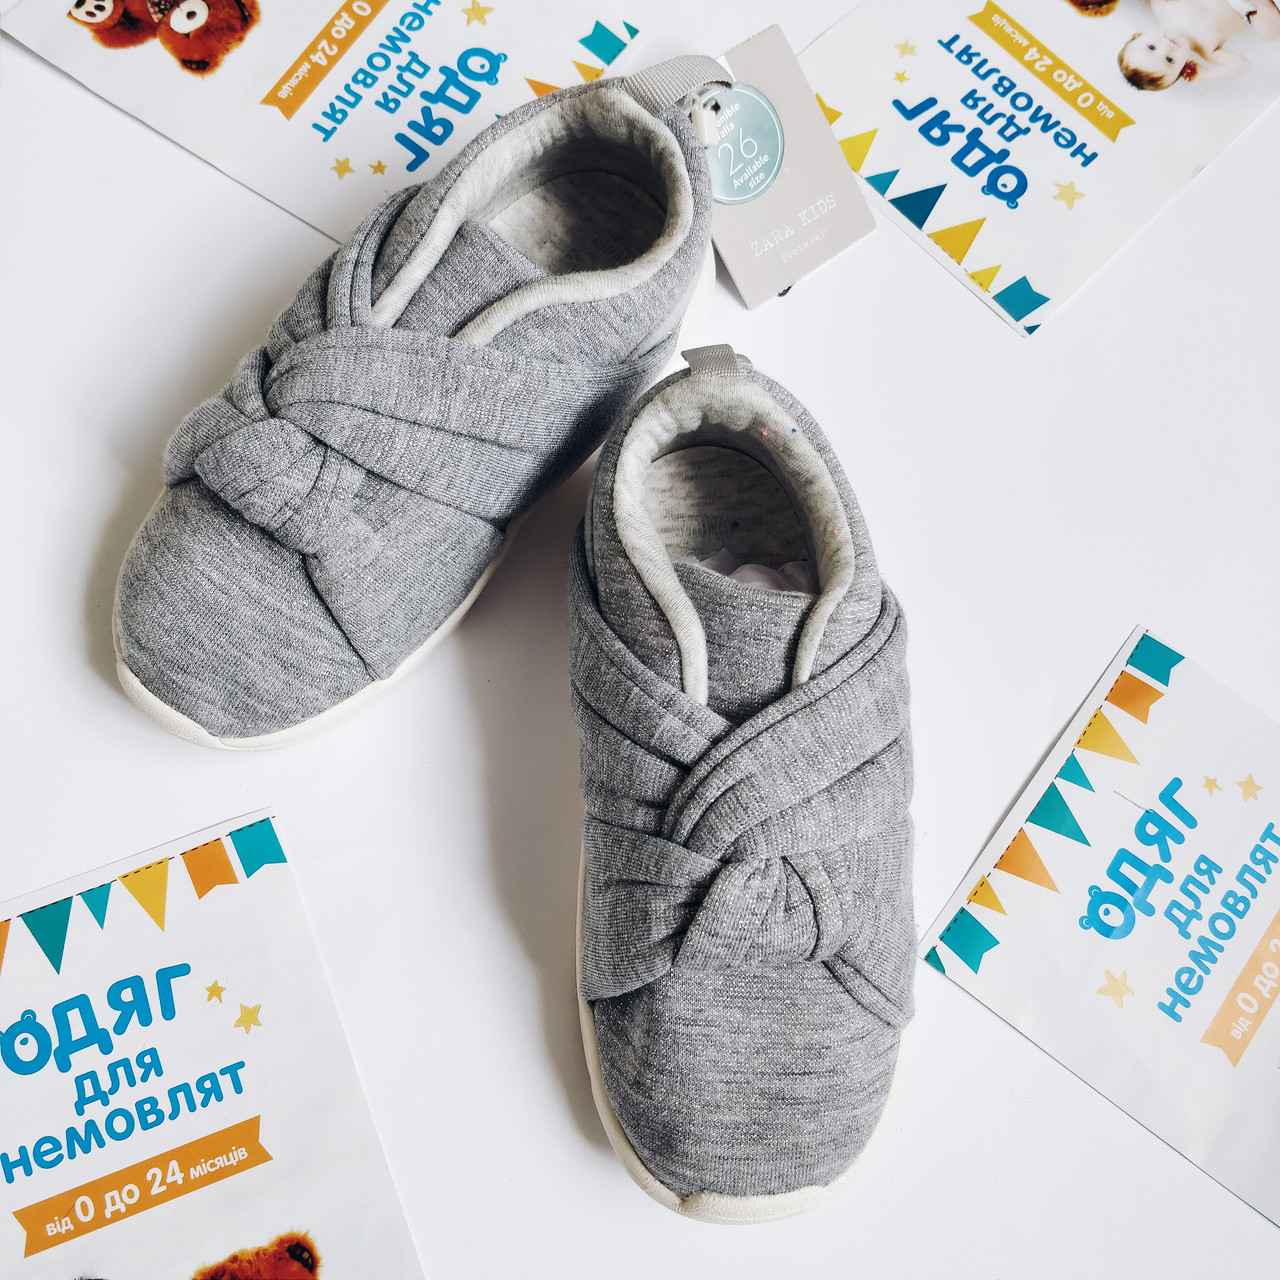 72a65ea1 Детские кроссовки для девочки Zara 25 р,26 р: продажа, цена в ...